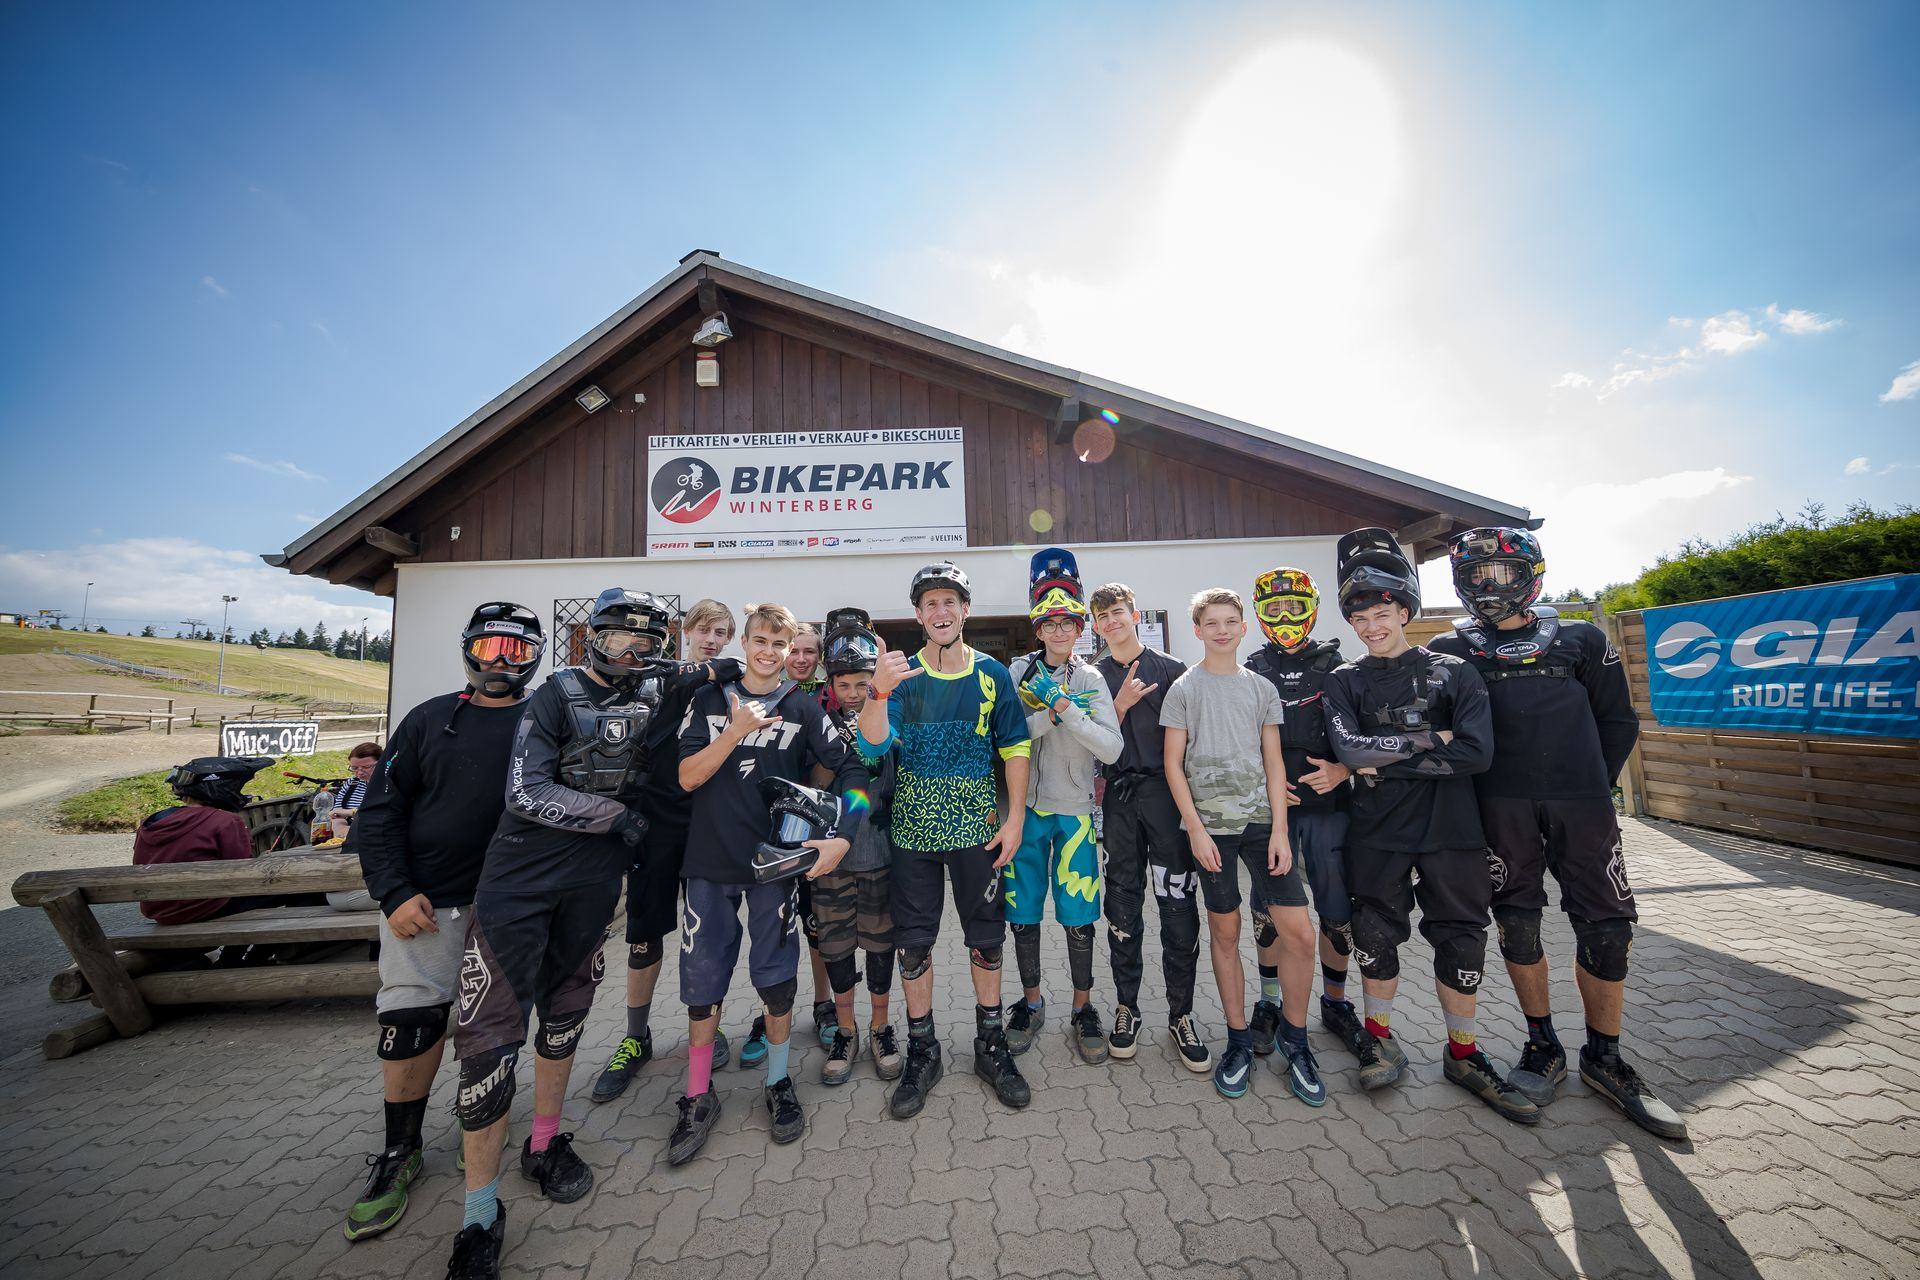 Termine bekannt - Jugendcamps im Bikepark Winterberg und Hostel Erlebnisberg Kappe